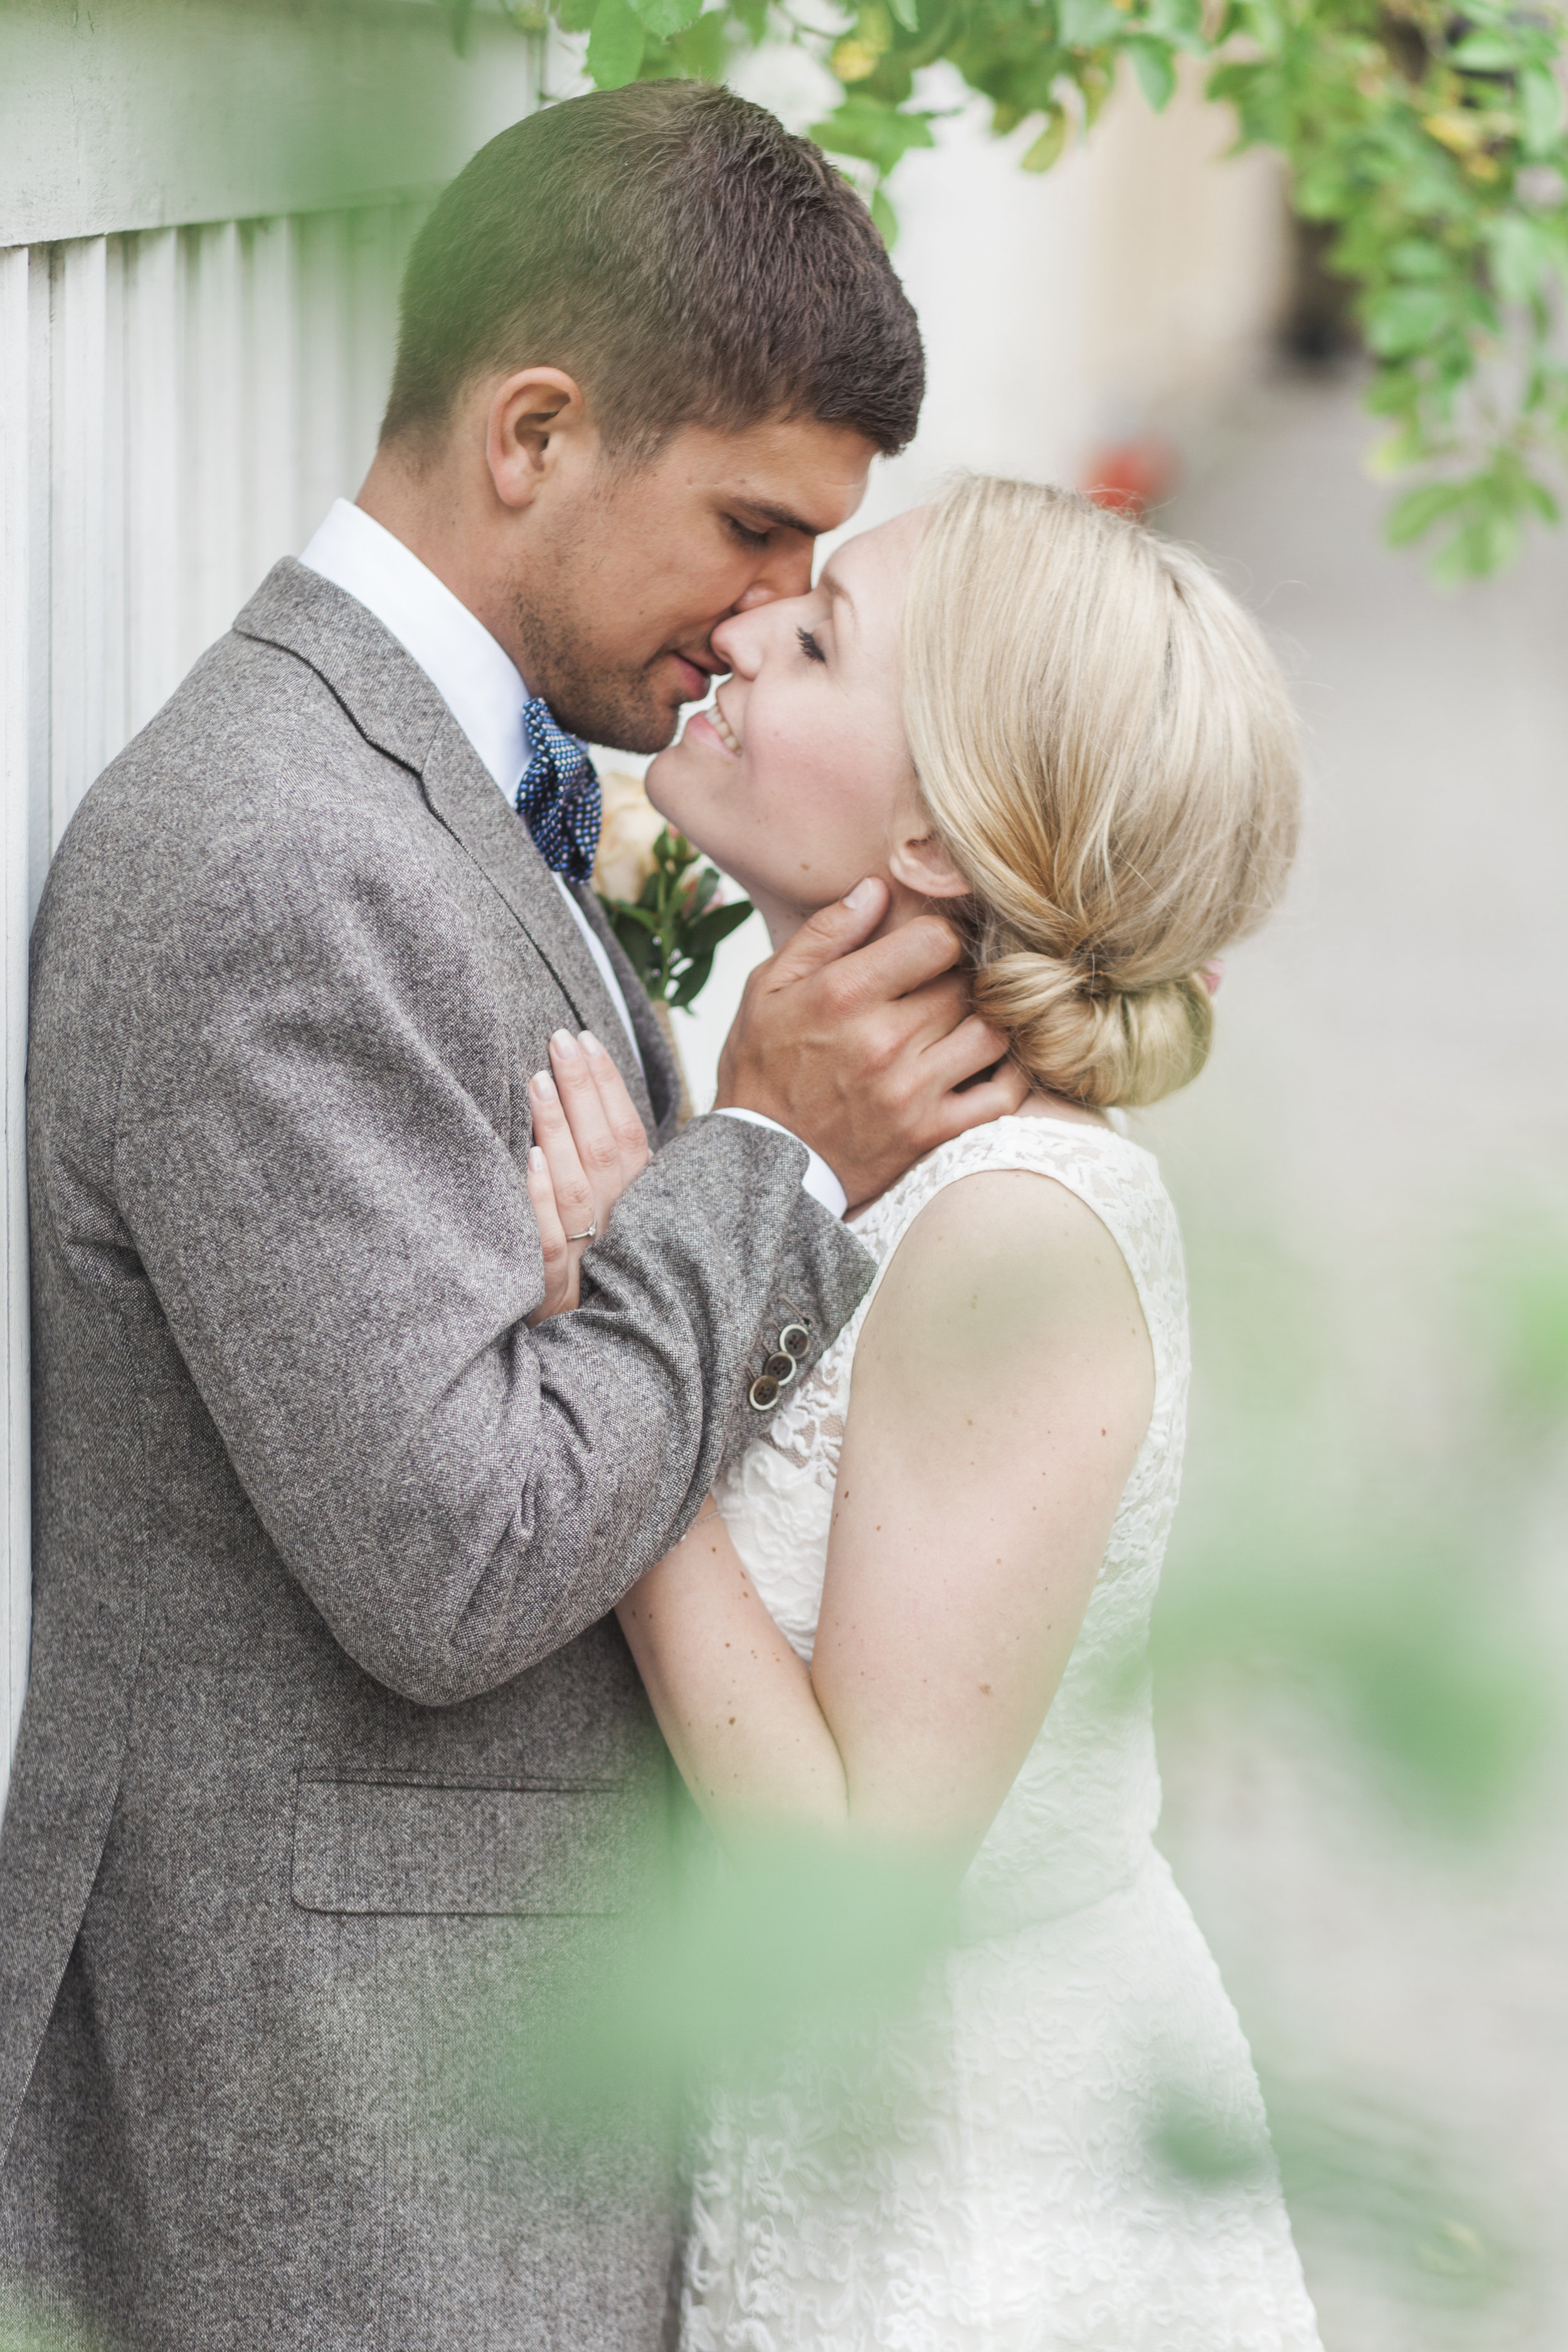 Bröllop-146.jpg